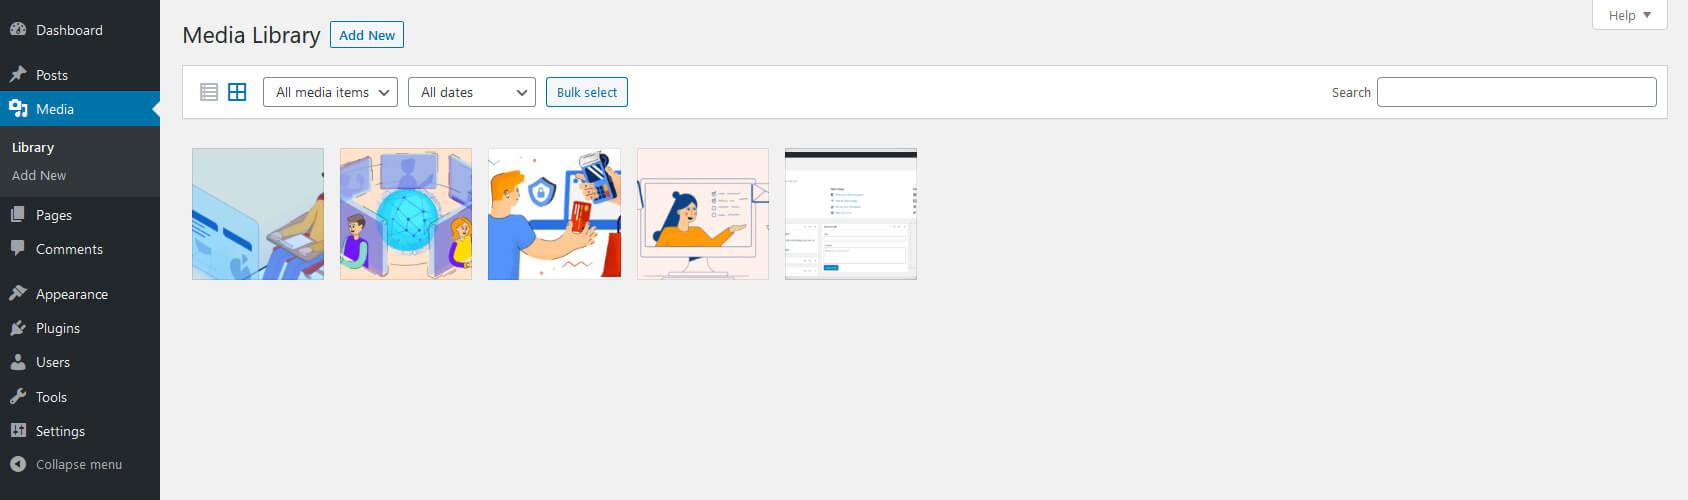 WordPress media library screen